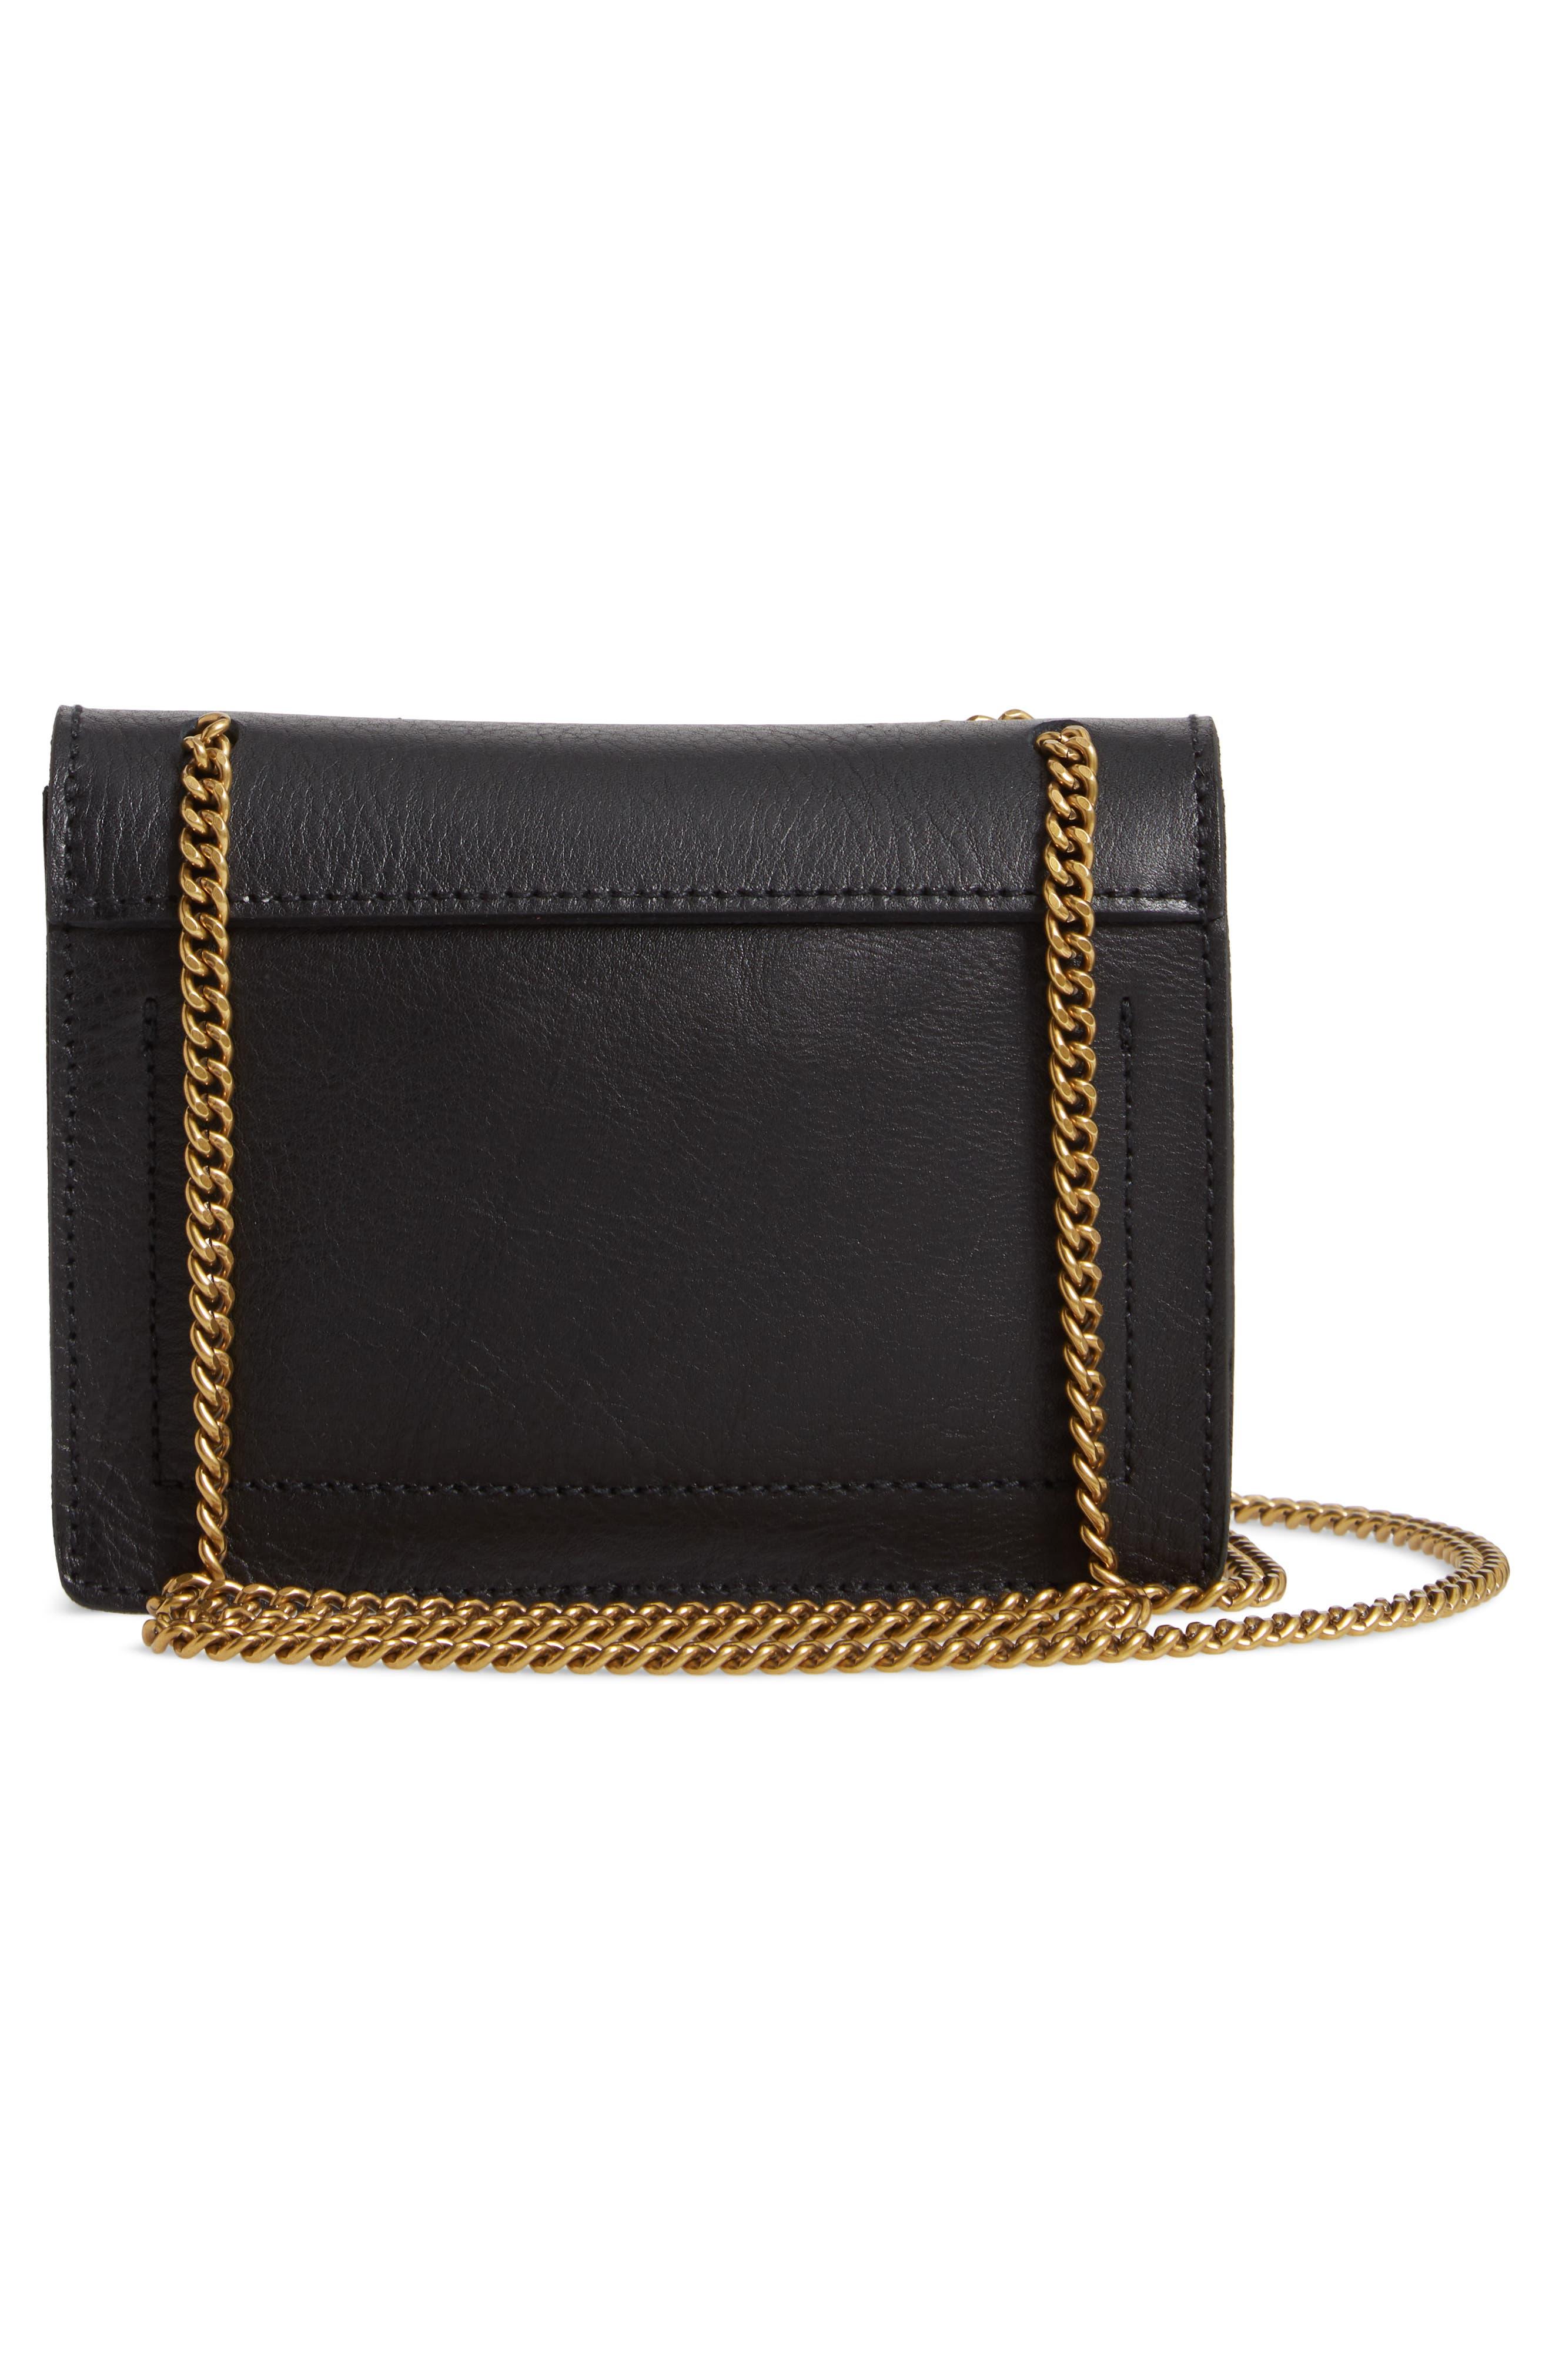 MADEWELL, Leather Crossbody Wallet, Alternate thumbnail 3, color, TRUE BLACK